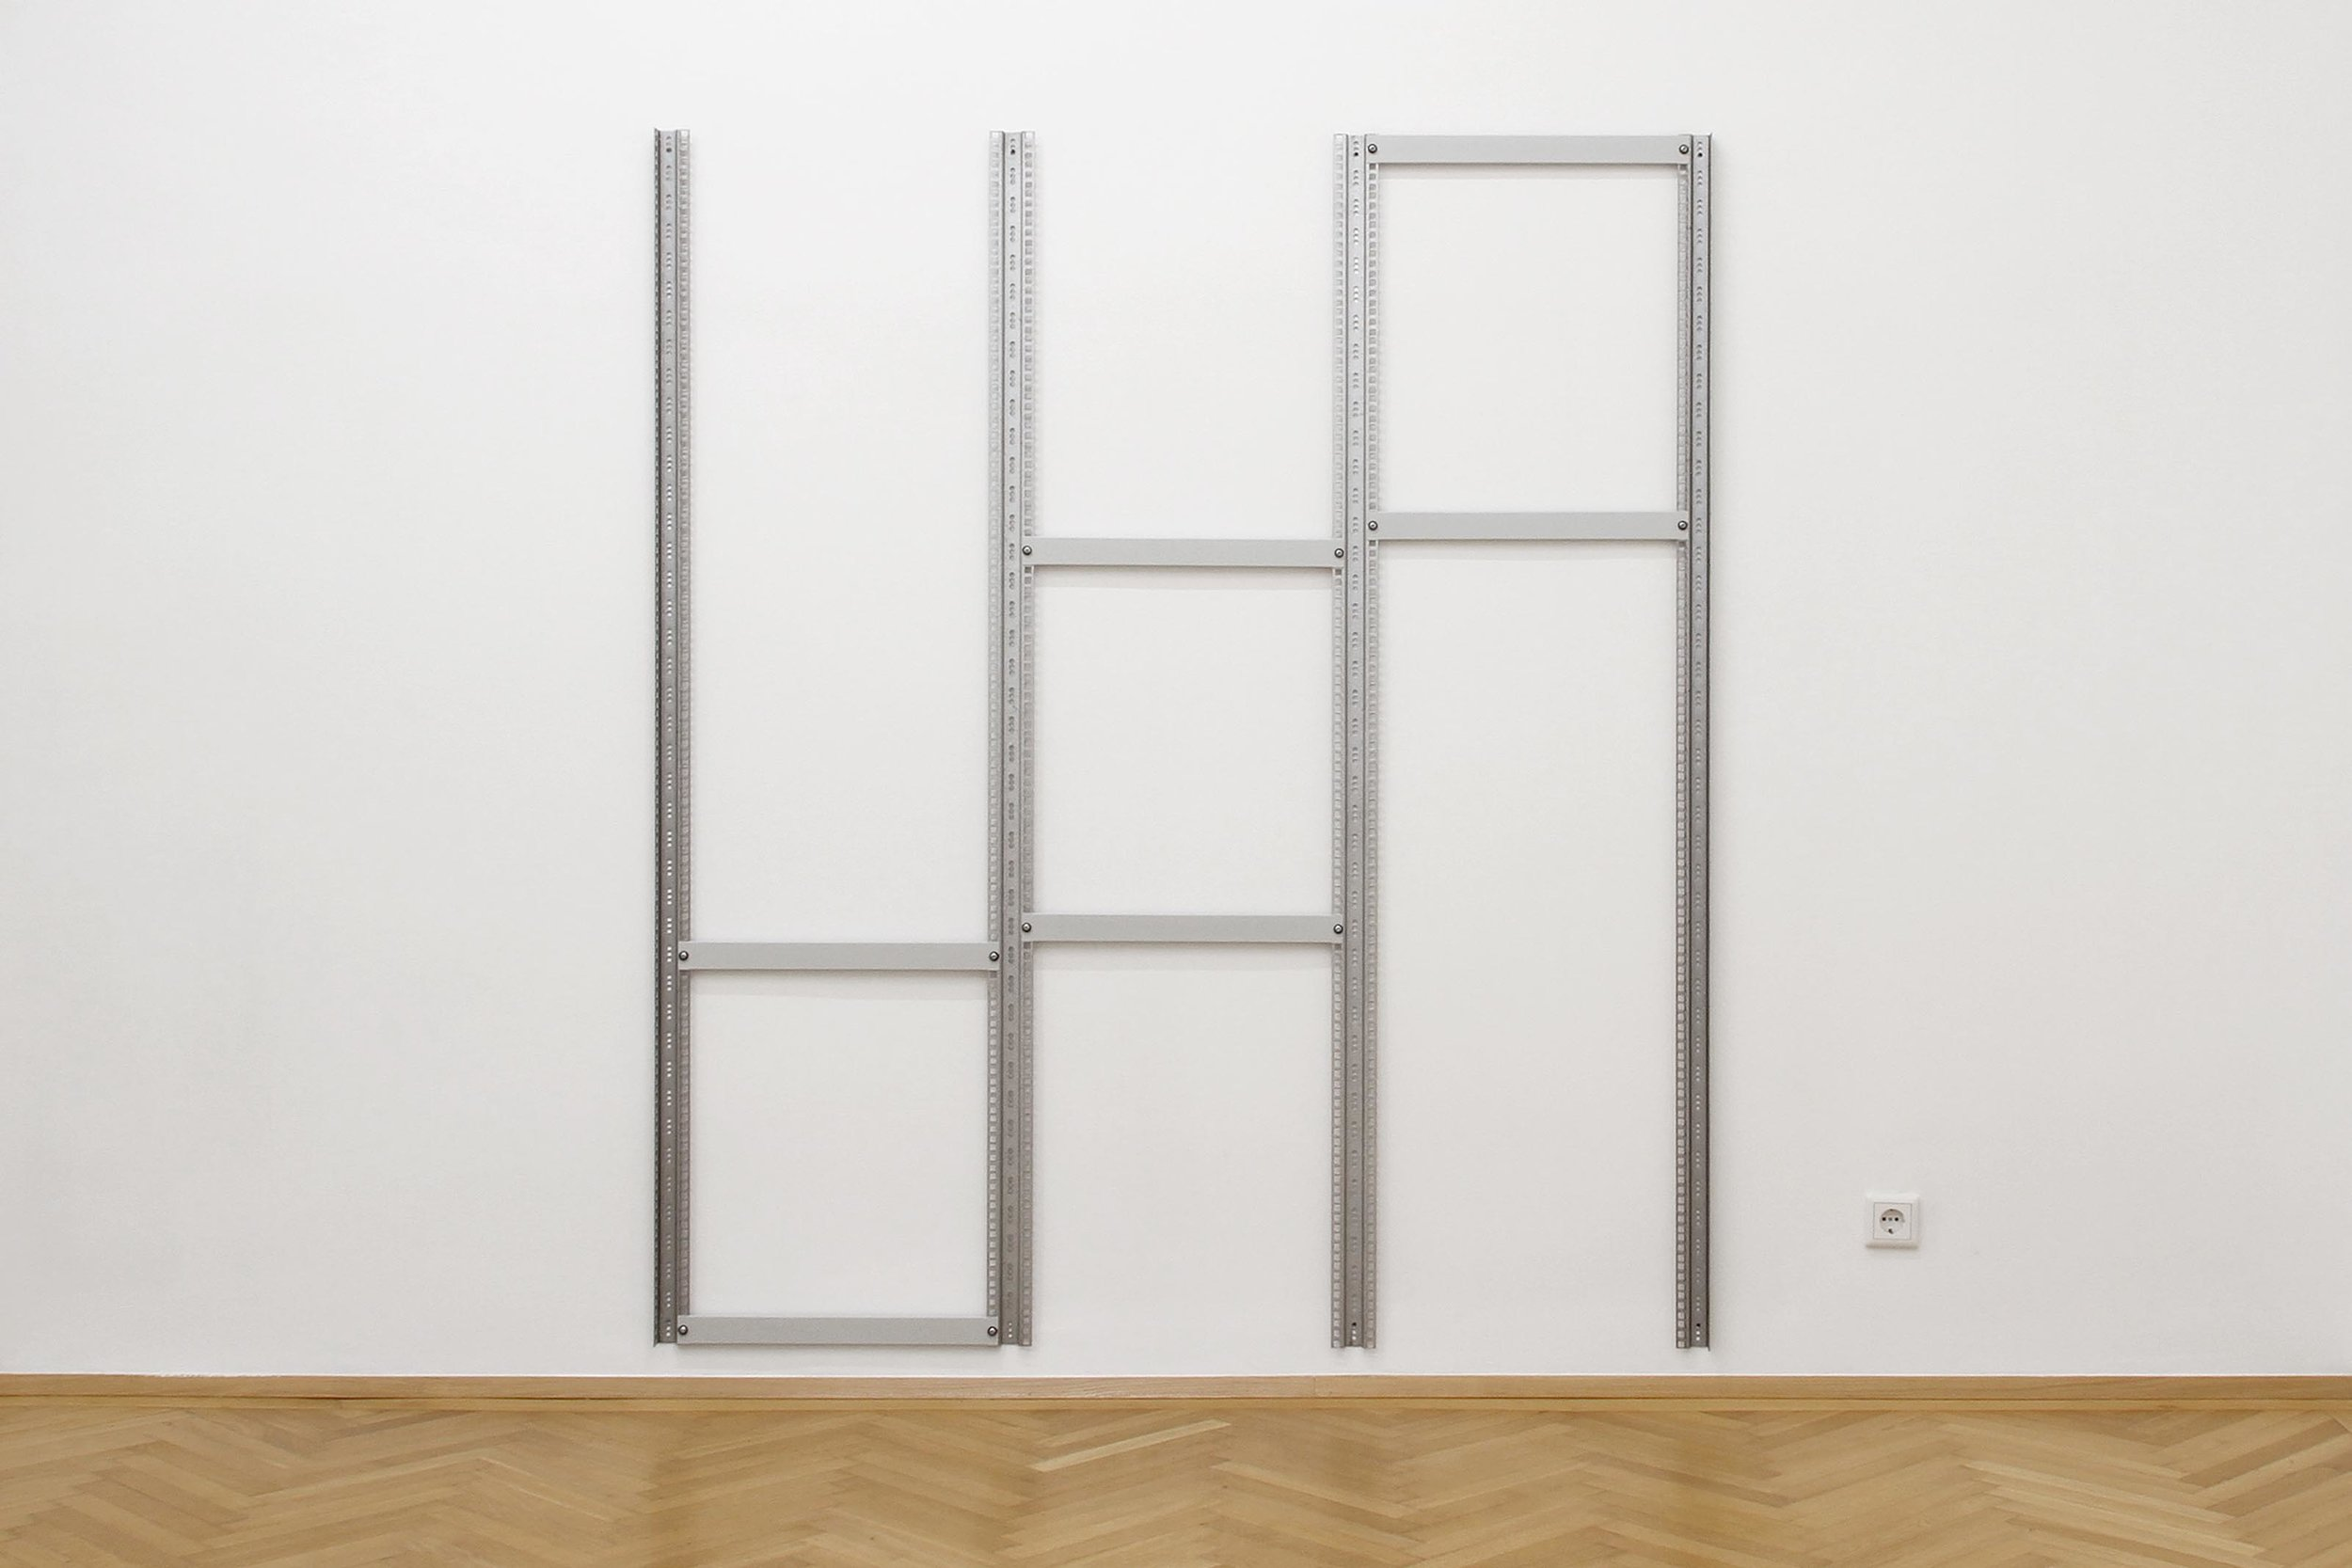 Ulrich Nausner, Memory Object (Grey) #5, 2017, server rack rails, blank panels, screws, 186,5 x 157,8 x 3,2 cm, 1 + 1AP